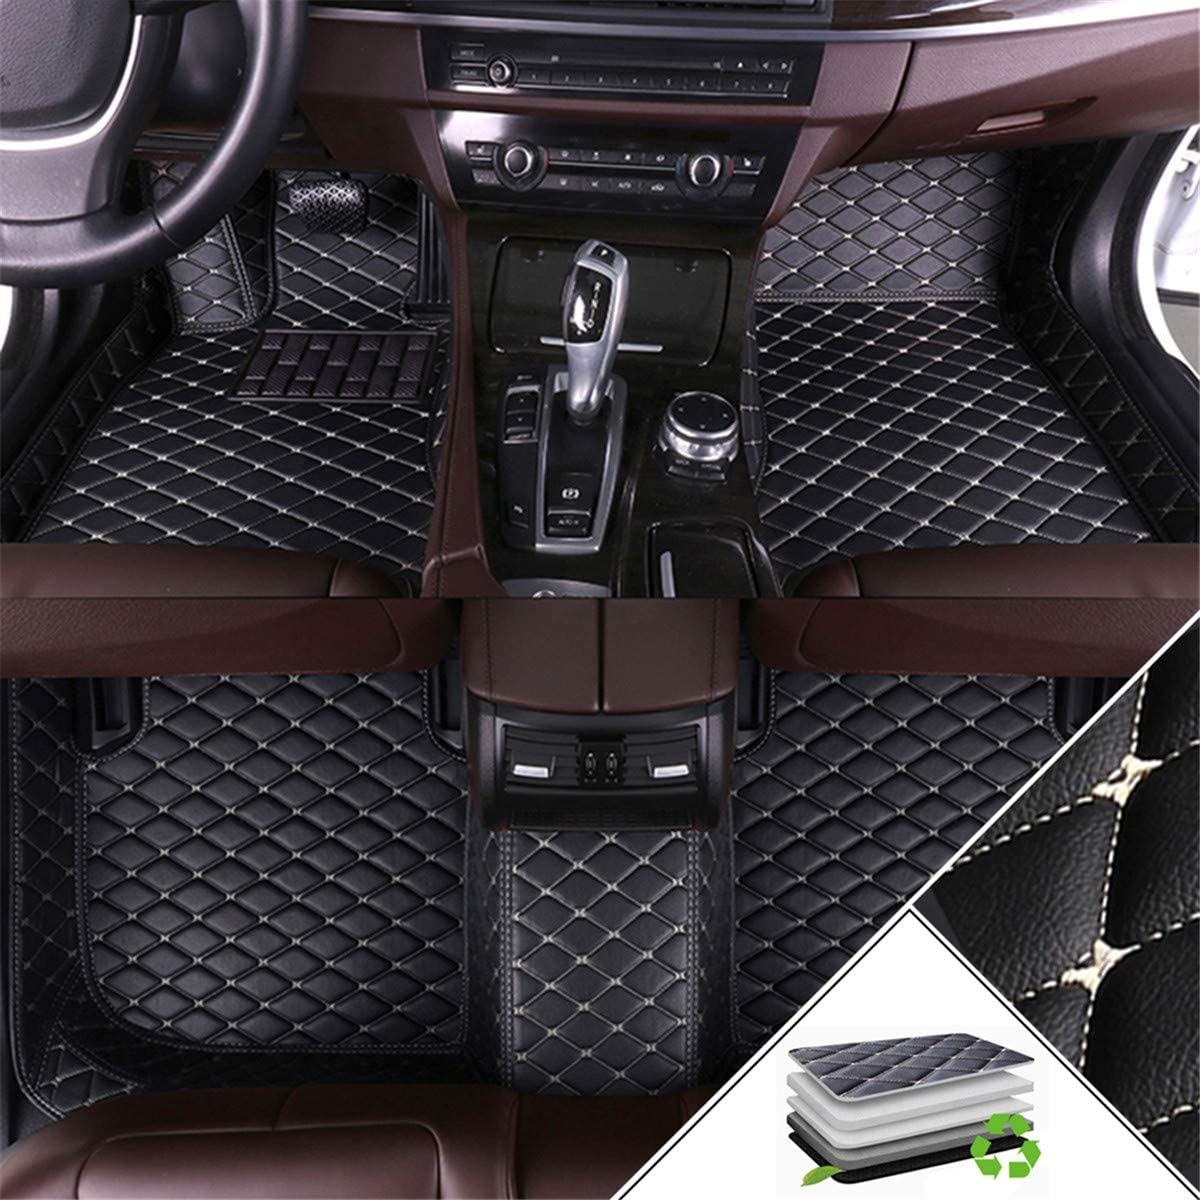 Handao-US Custom Car Floor Mats for Audi Q3 2019 All Weather Non-Slip Full Coverage Protection Luxury Leather Car Liner Set Black Beige